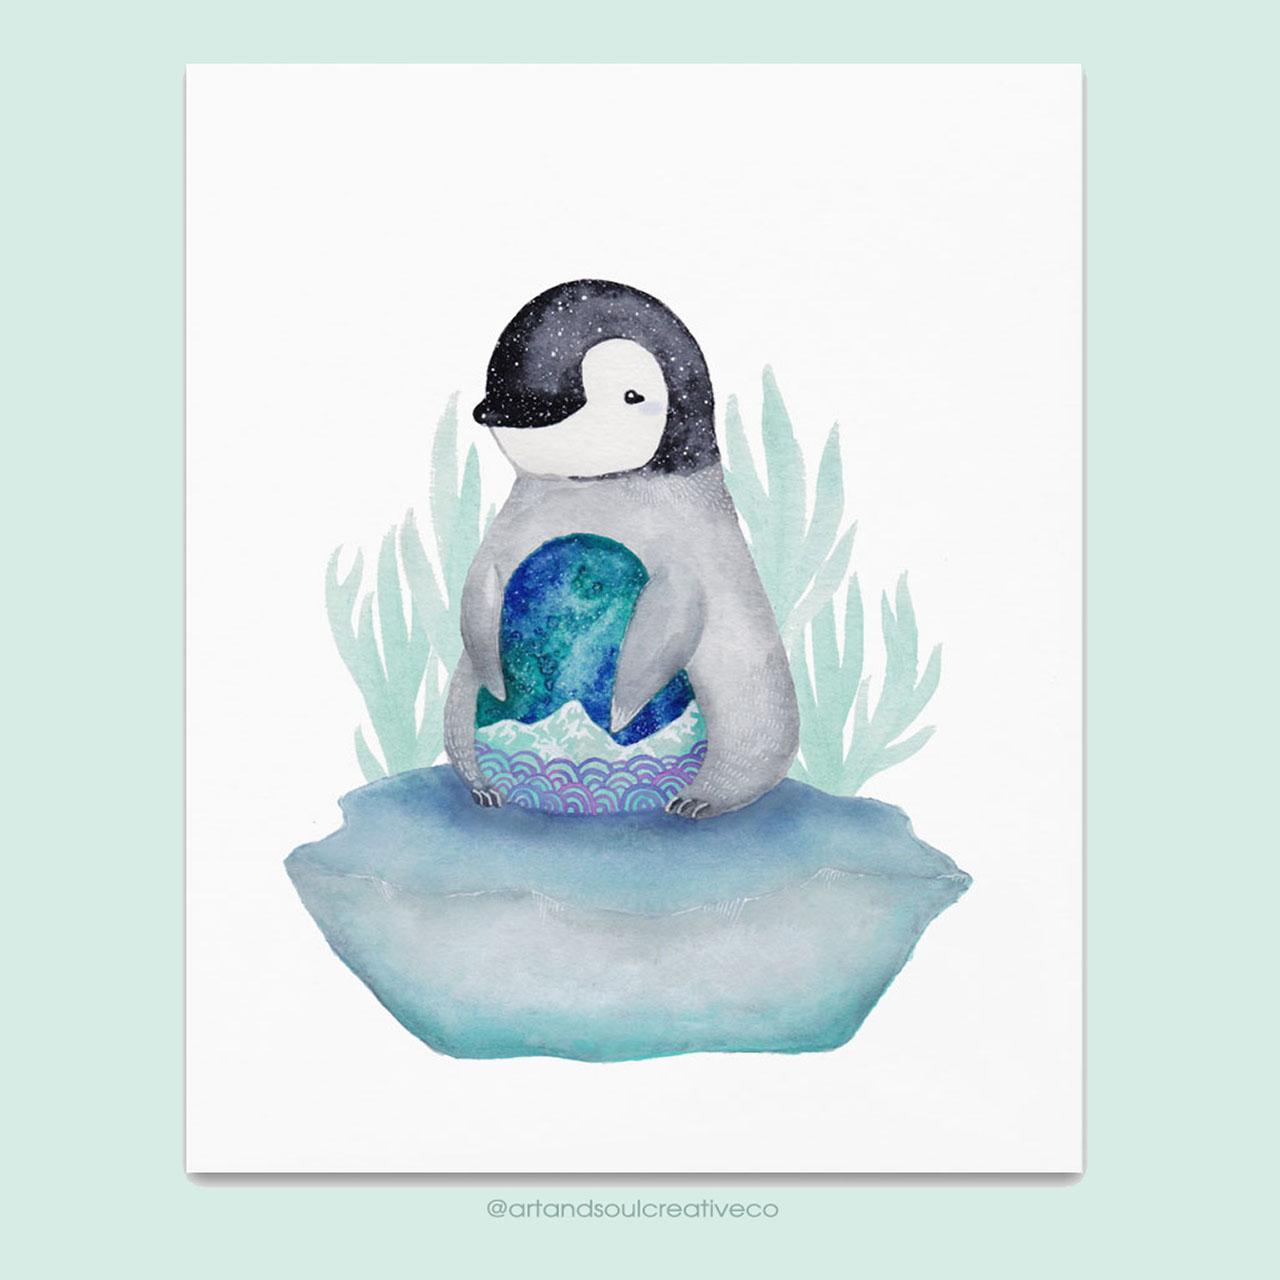 Pendulum Magazine Interview with Artist Laura Uy Penguin Dumpling